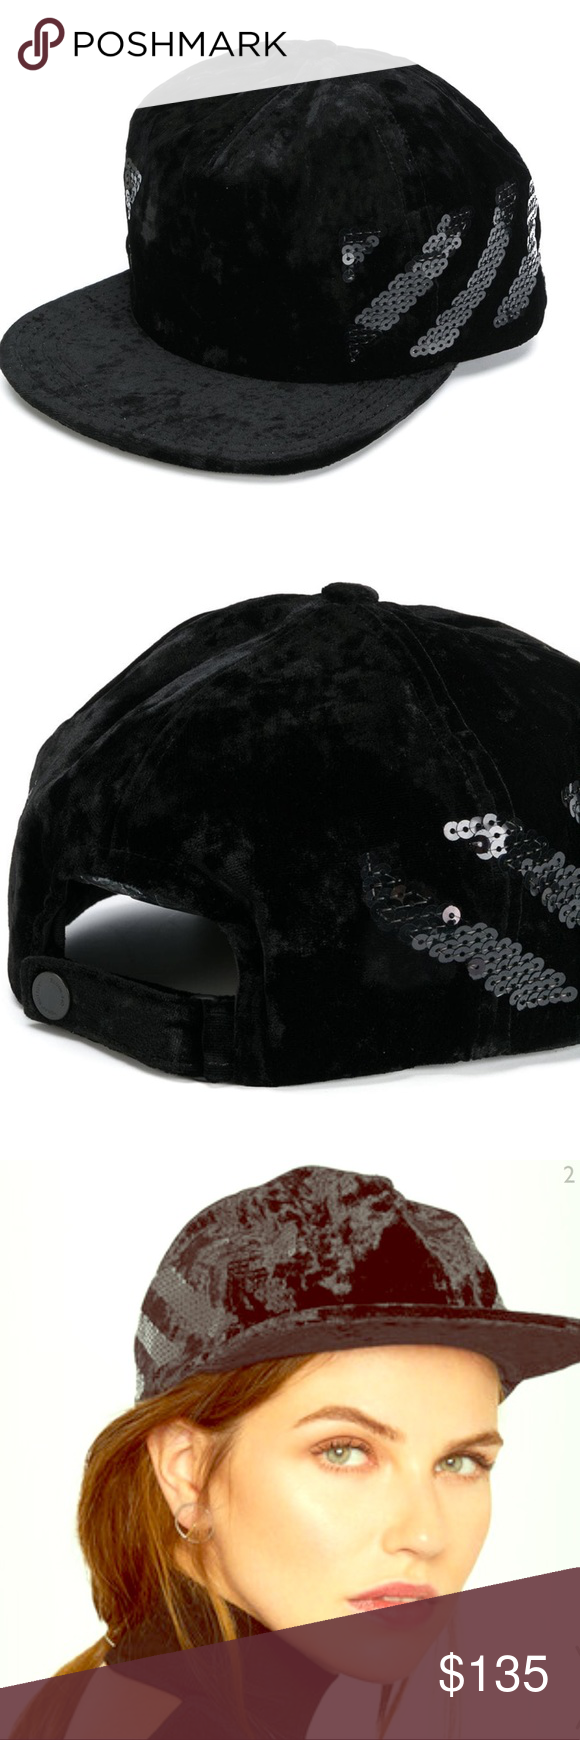 0cee3a4b5 ⭐Authentic Off-White Velvet Baseball Cap w/sequin Off-White's plush ...